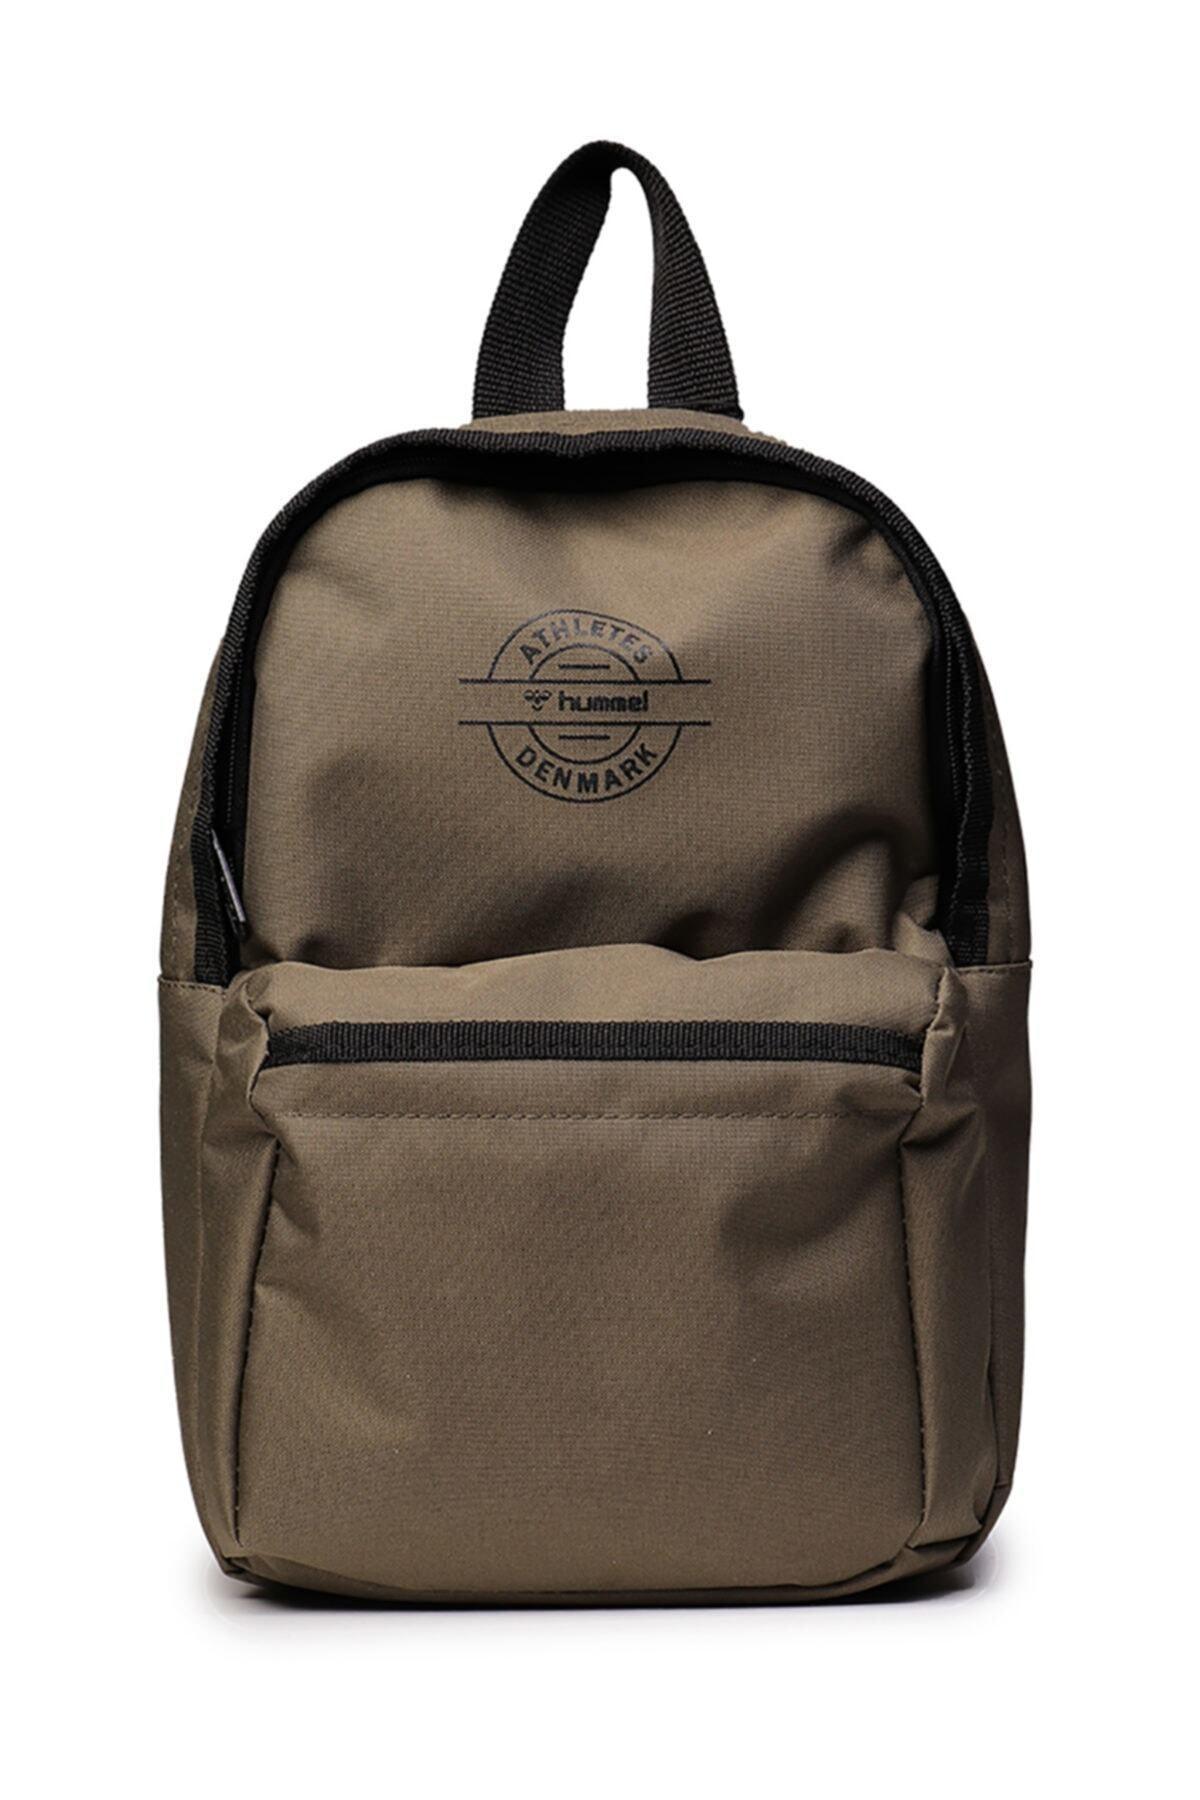 HUMMEL Yule Pack Kahverengi Sırt Çantası (980104-7871) 1